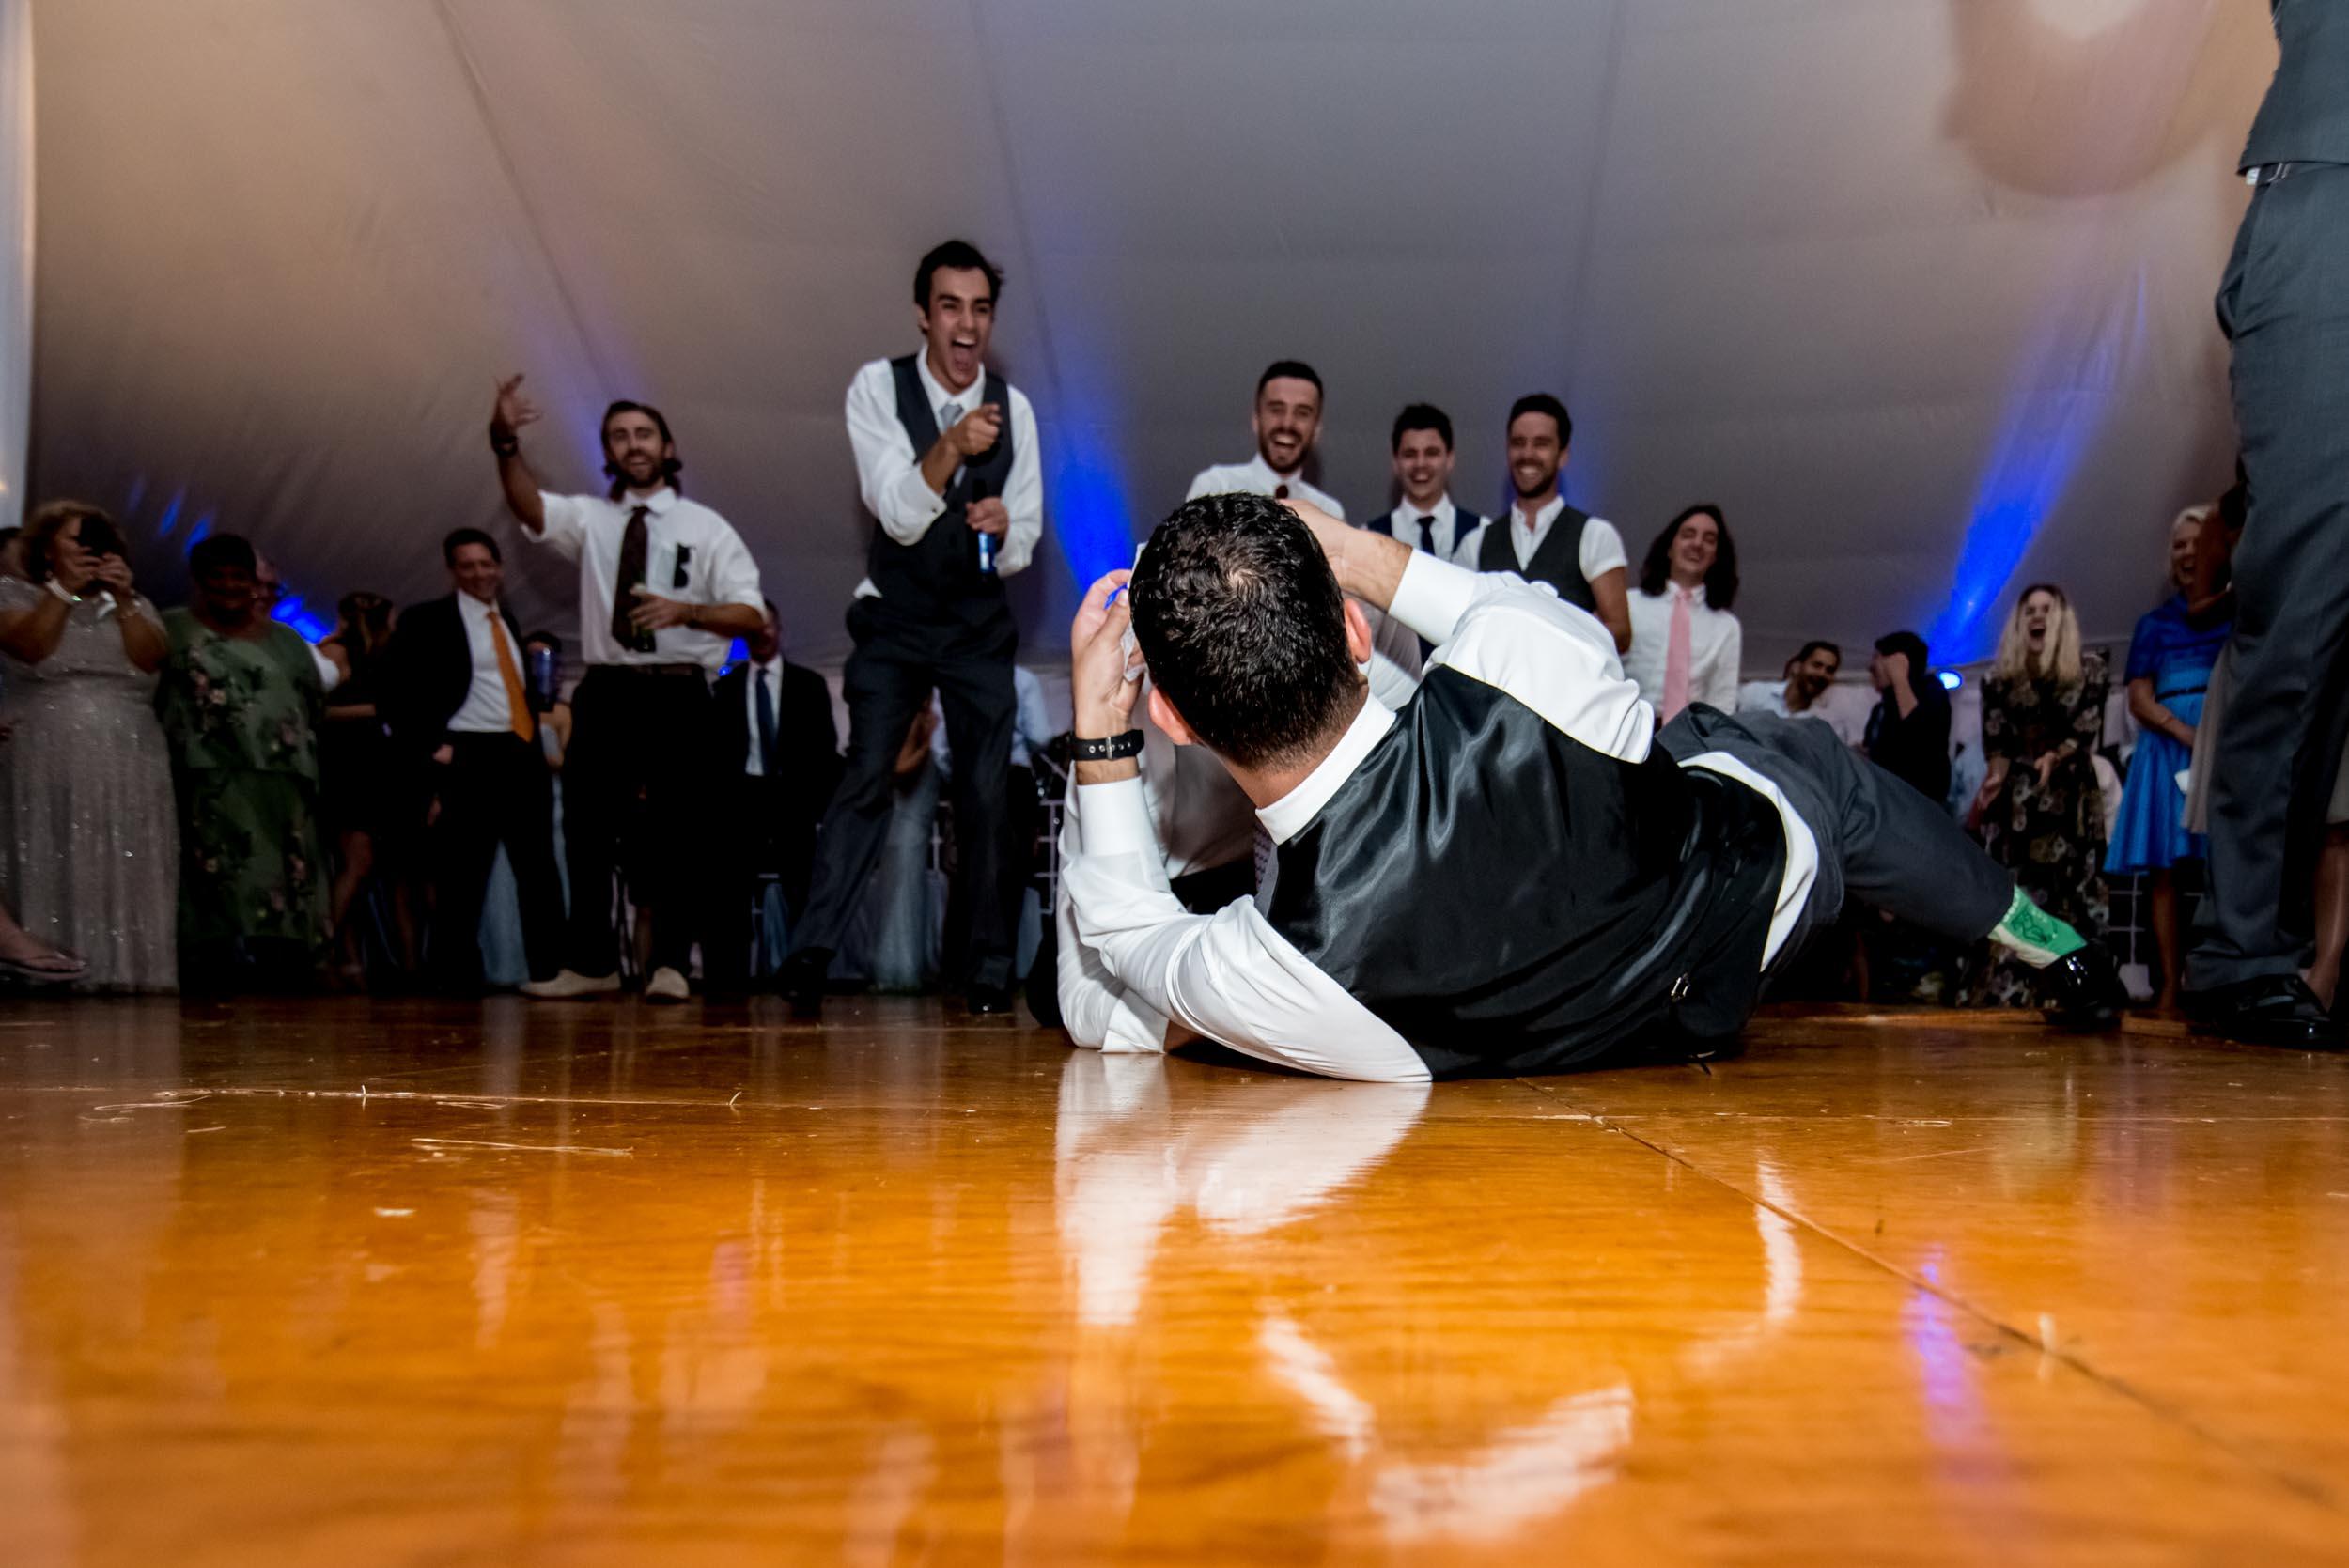 dc+metro+wedding+photographer+vadym+guliuk+photography+wedding+garter+toss-2028.jpg